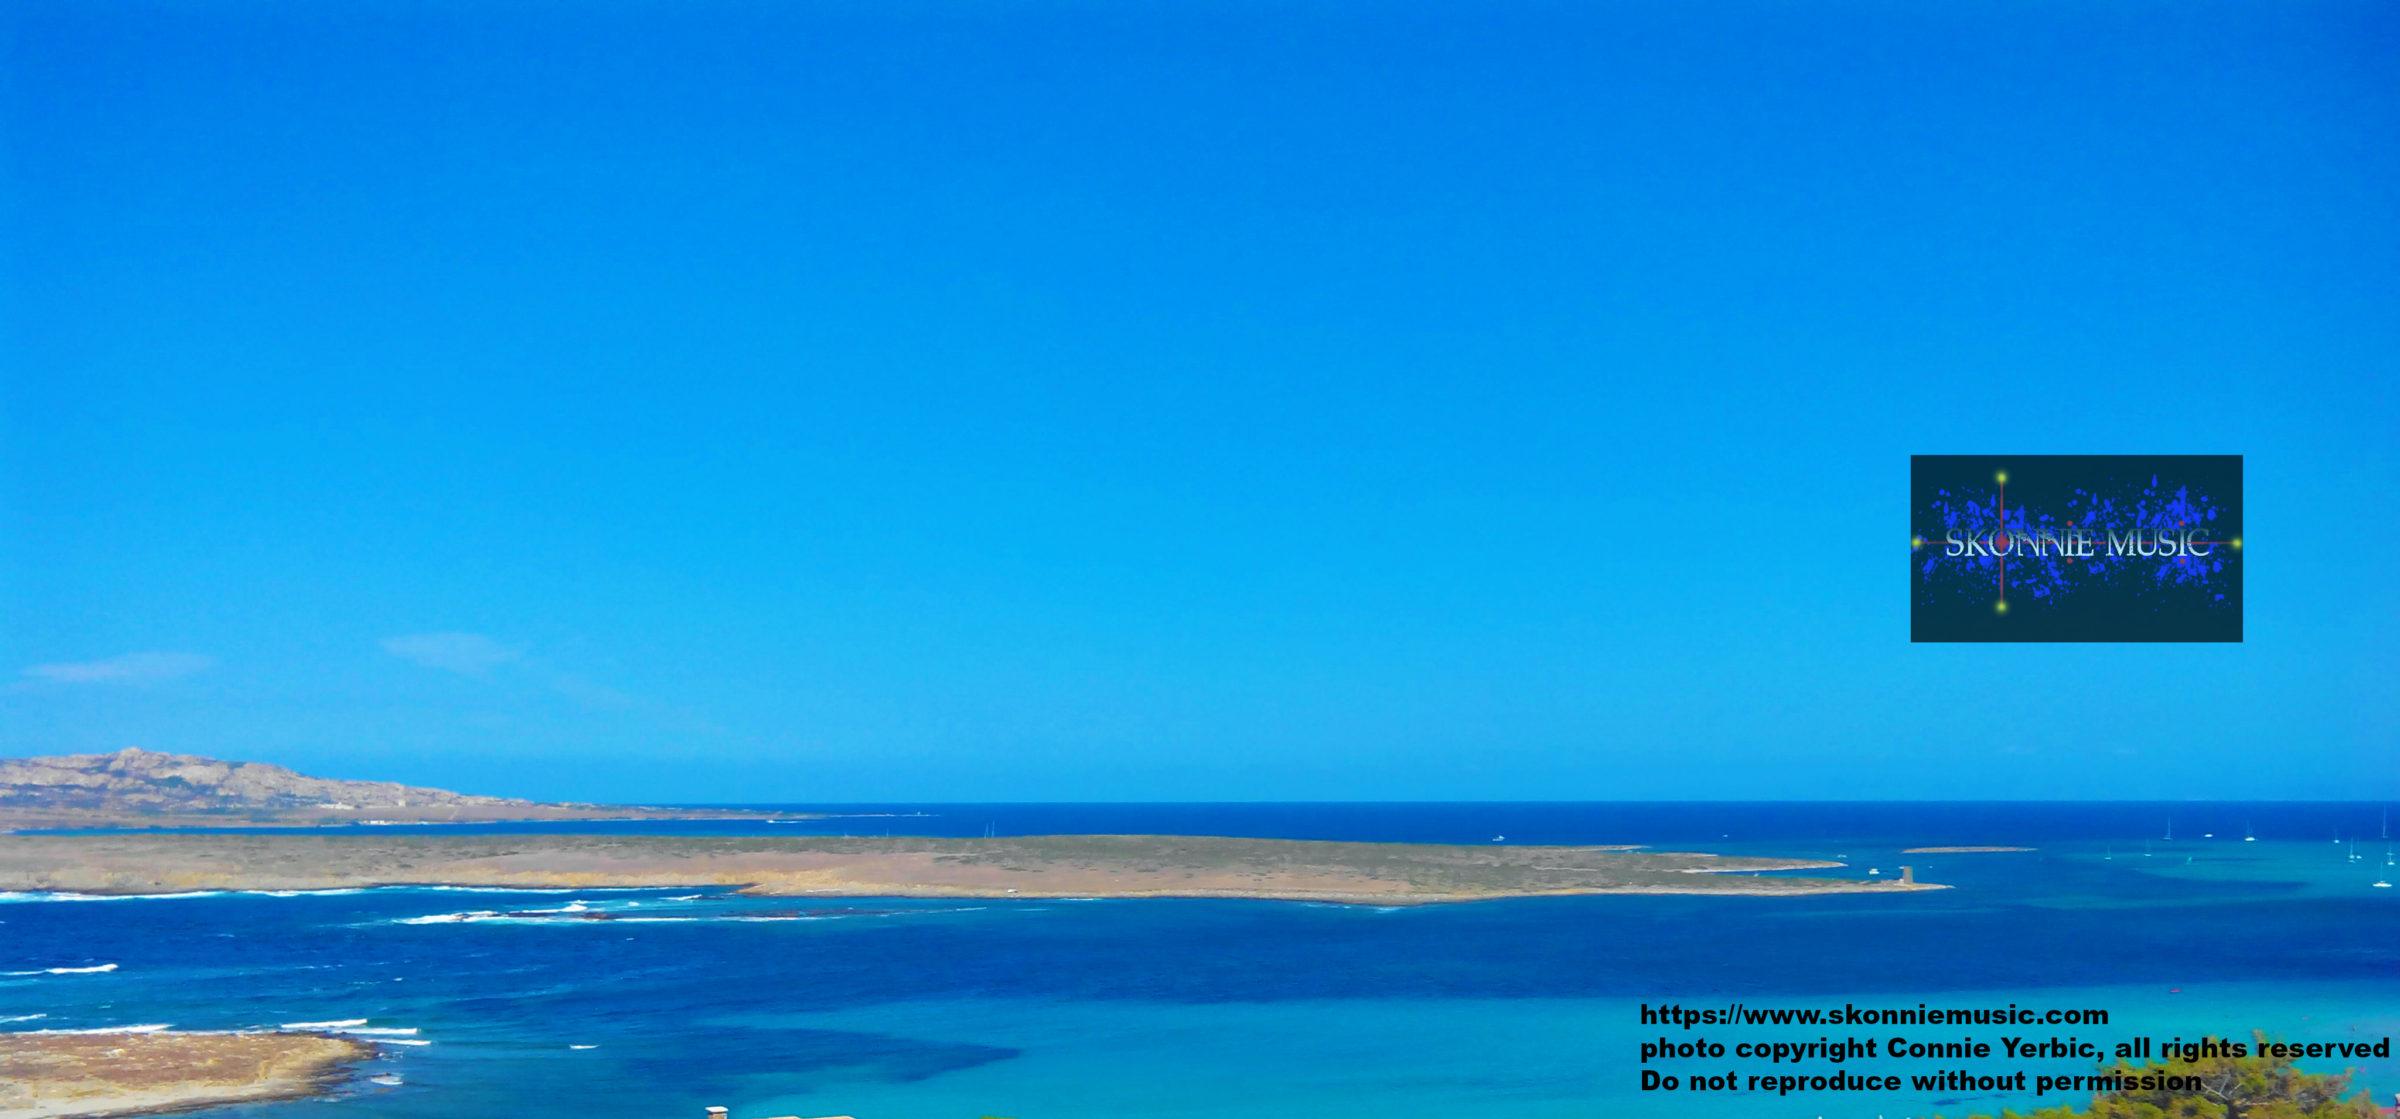 Sardinia, Italy, Travel, Skonnie